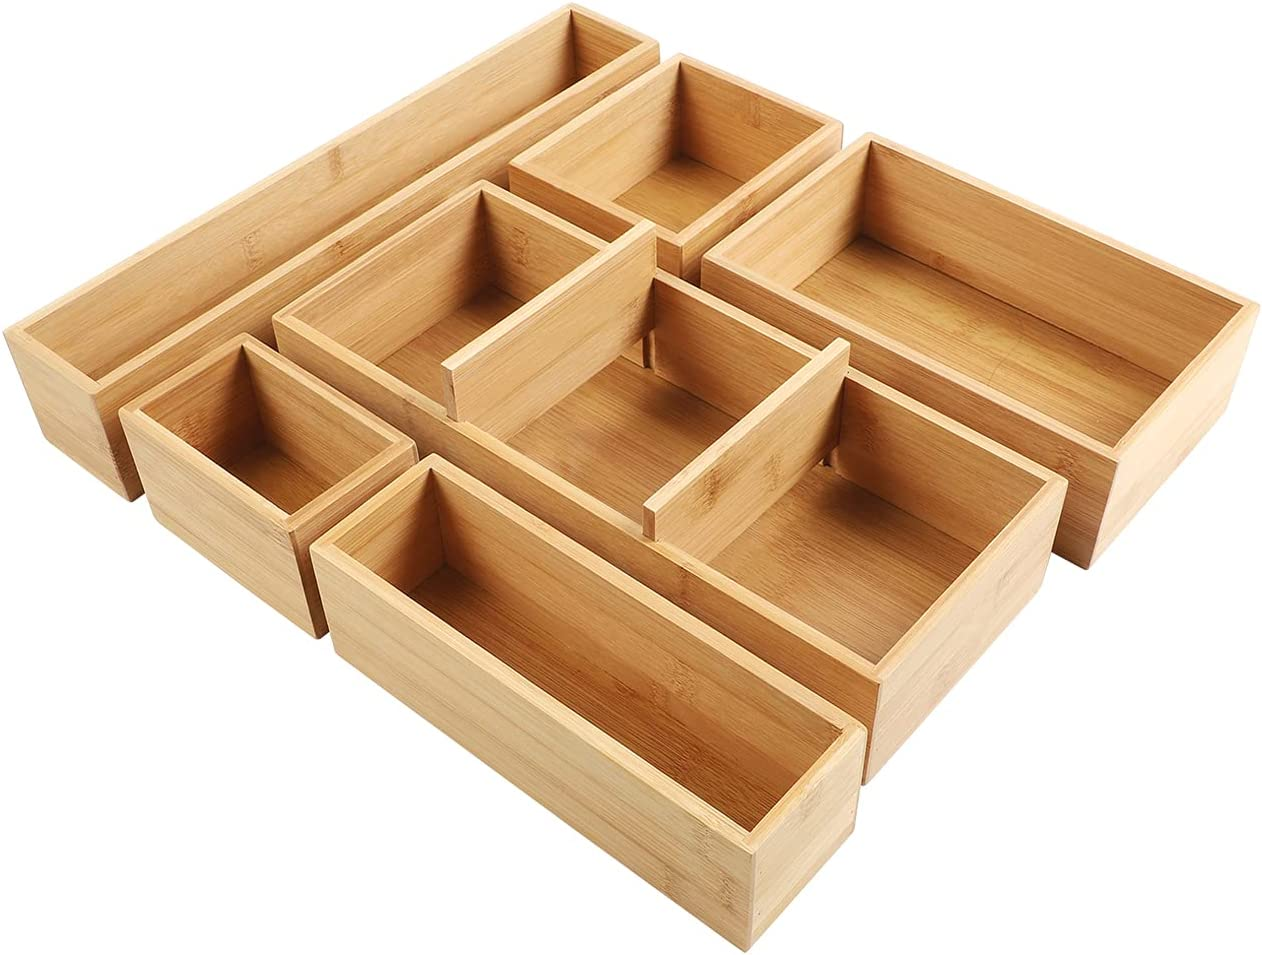 Kootek Adjustable Bamboo Drawer Organizers Utensil Tray Kitchen Storage Organizer 6-Piece Cutlery Silverware Holder Bins Container with Removable Dividers for Desk Closet Bathroom Office